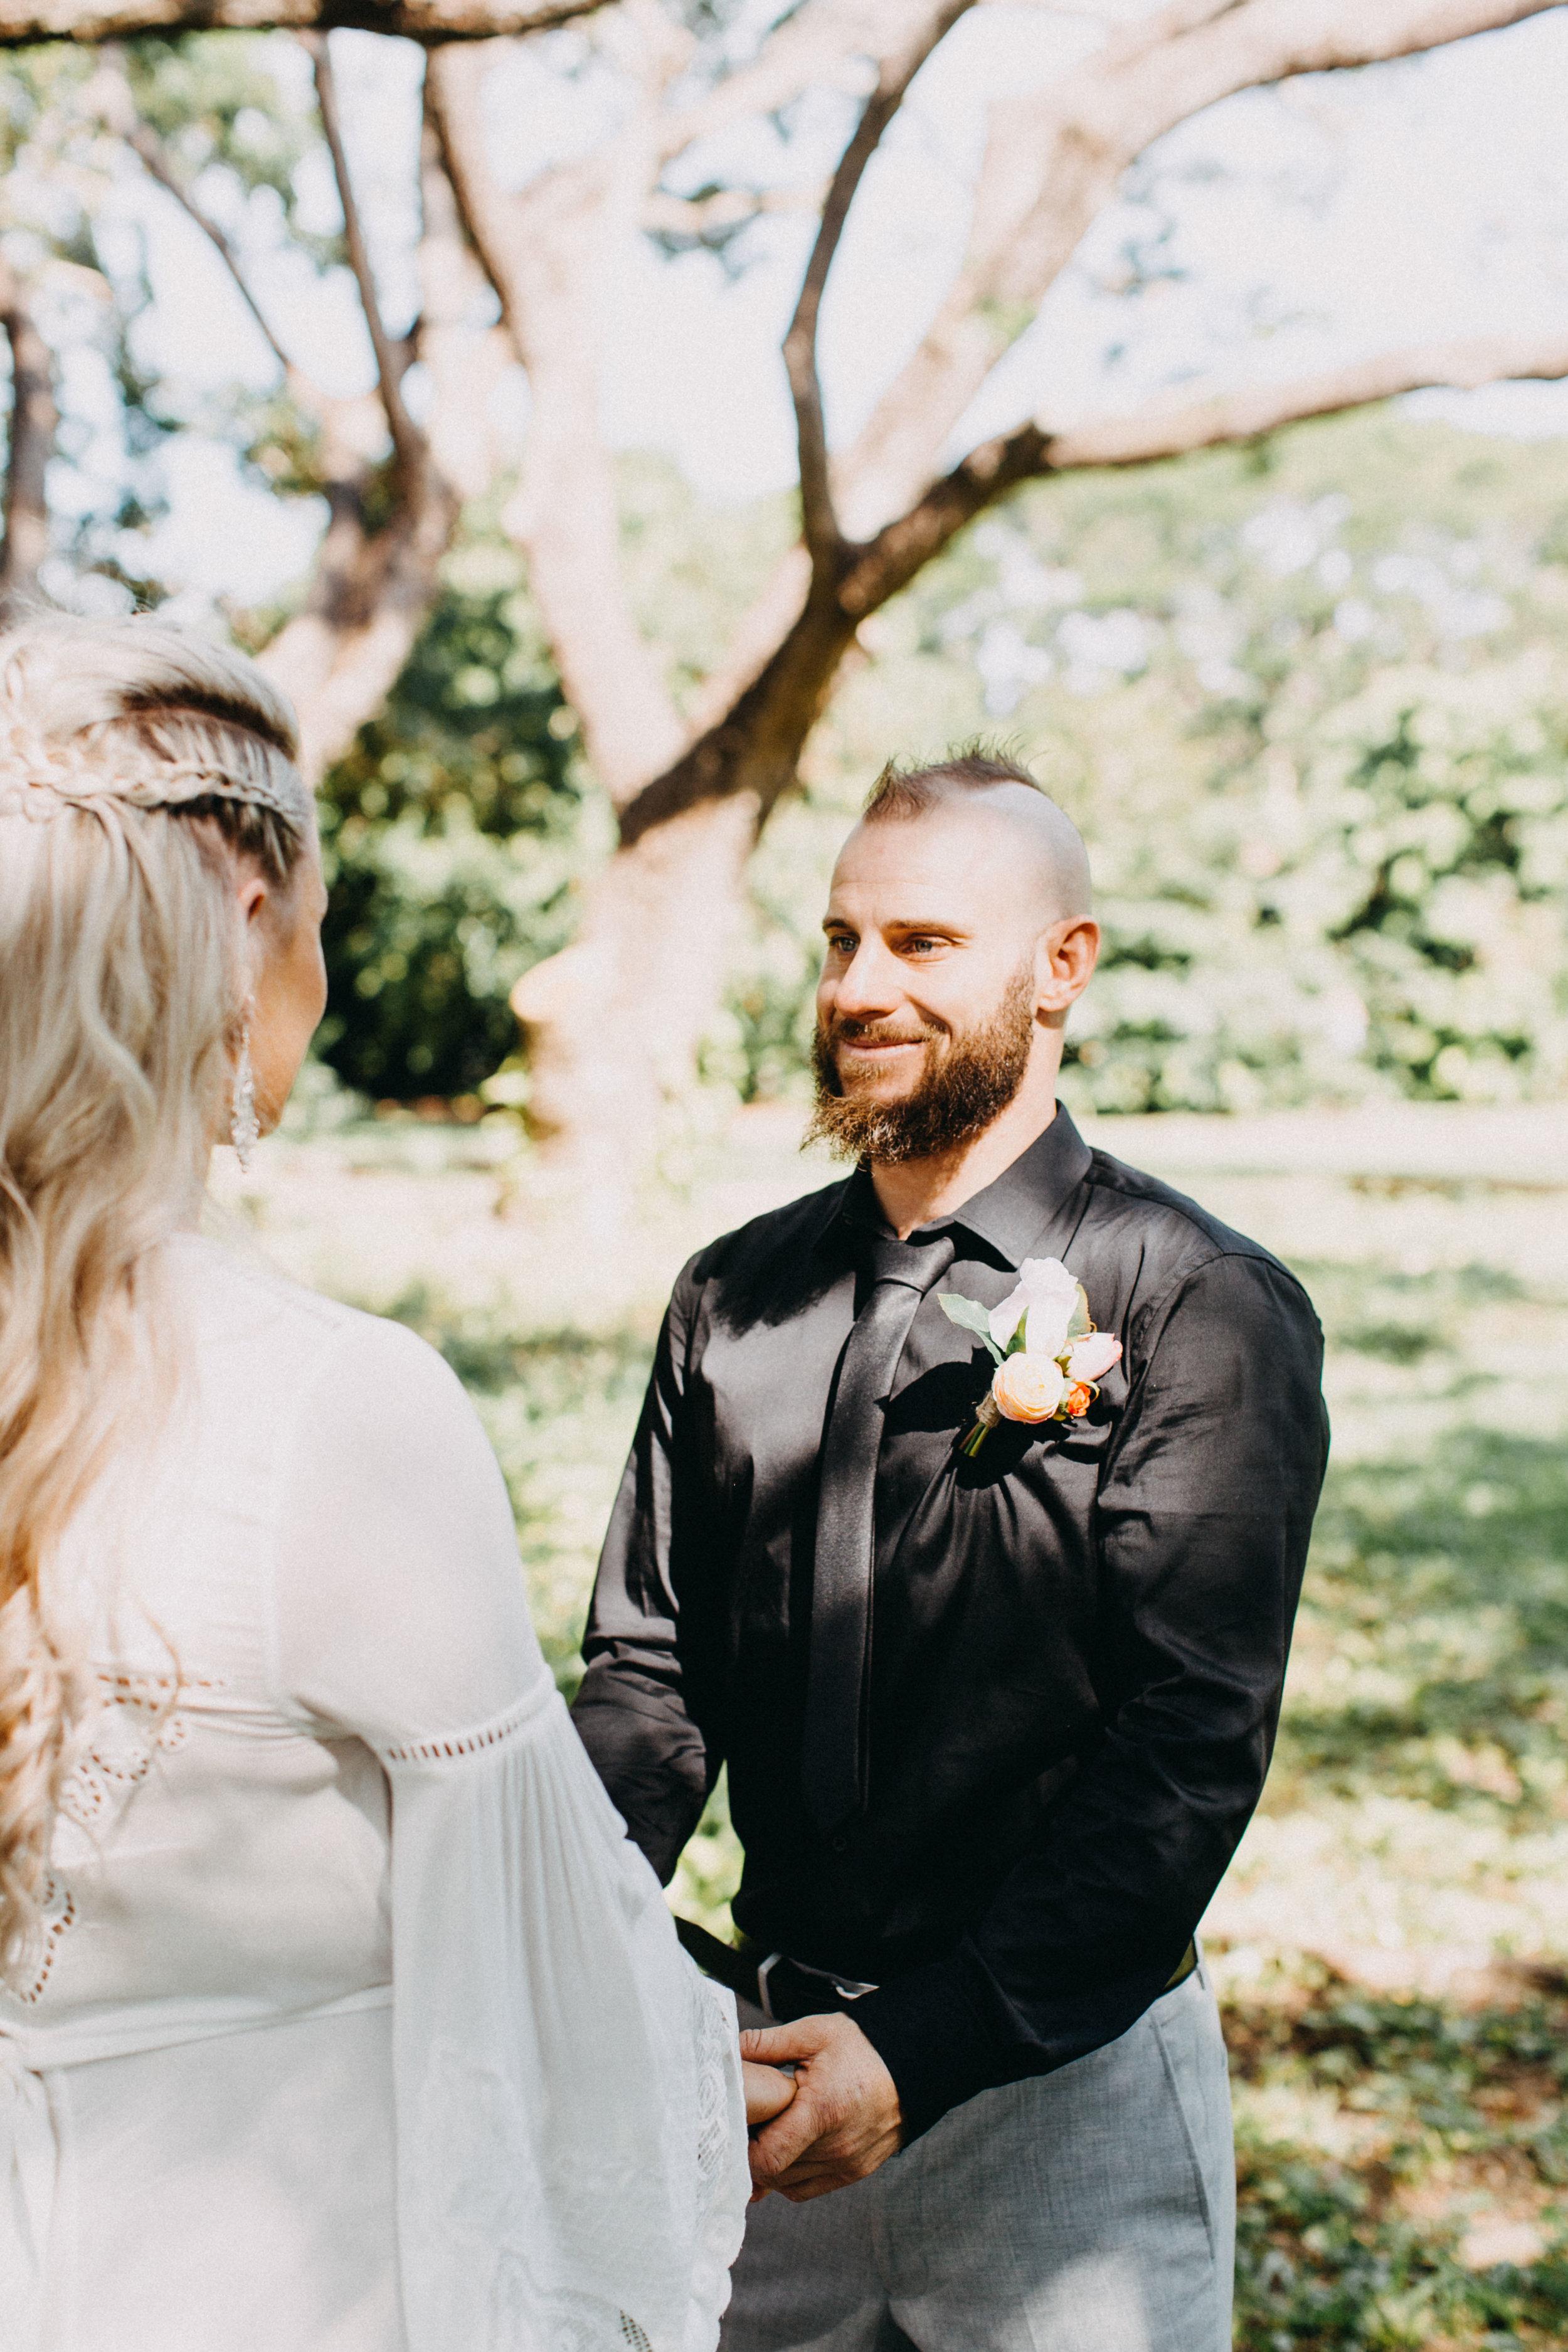 darwin-elopement-wedding-beach-camden-photography-www.emilyobrienphotography.net-15.jpg